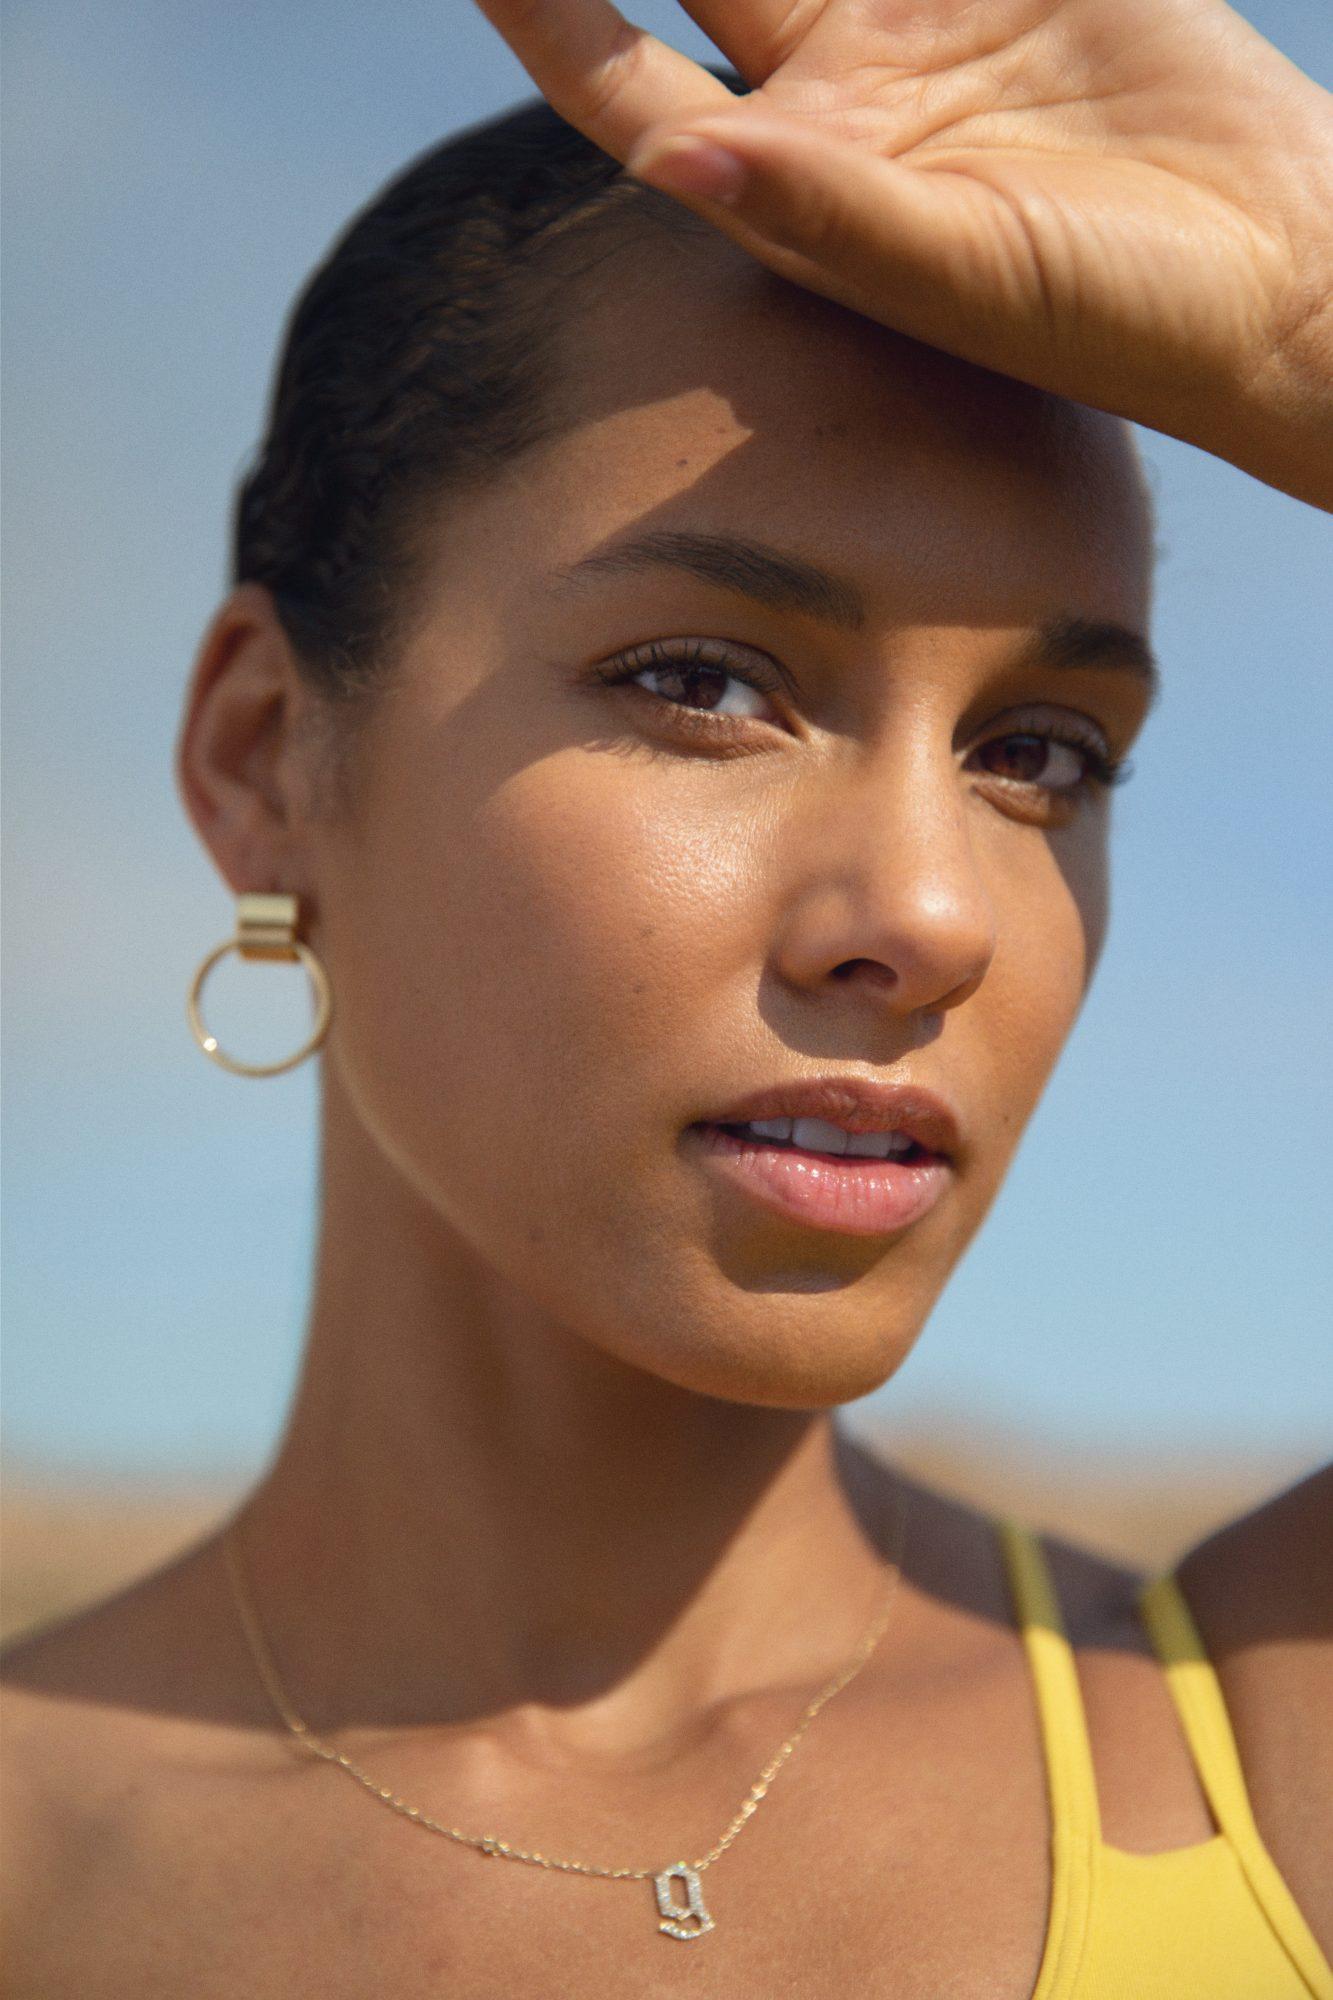 Alicia Keys - DO NOT REUSE